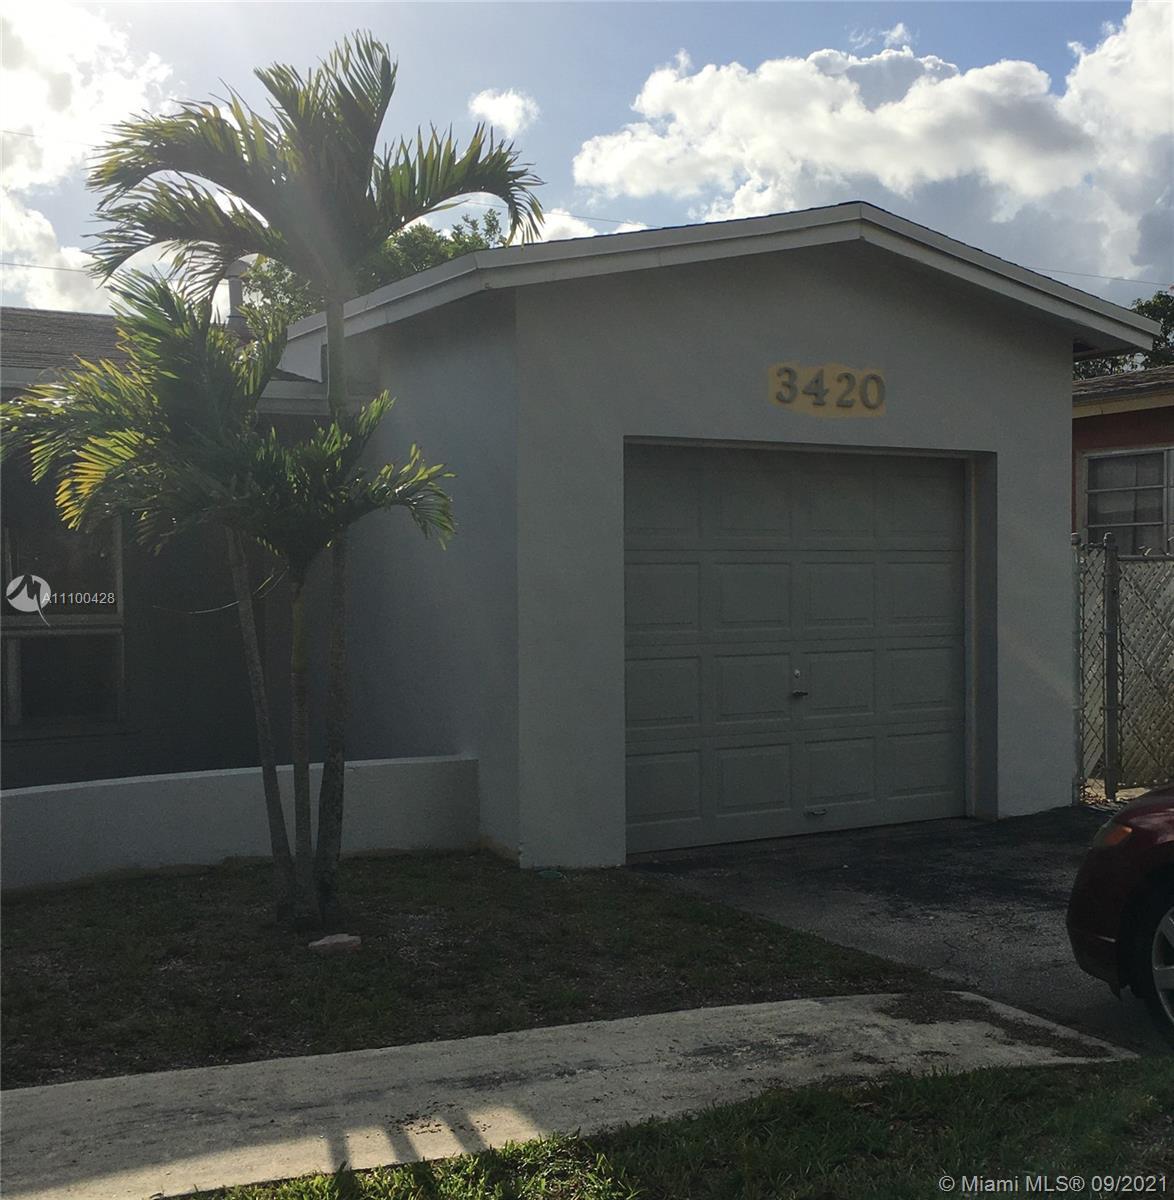 Miramar Park - 3420 Island Dr, Miramar, FL 33023